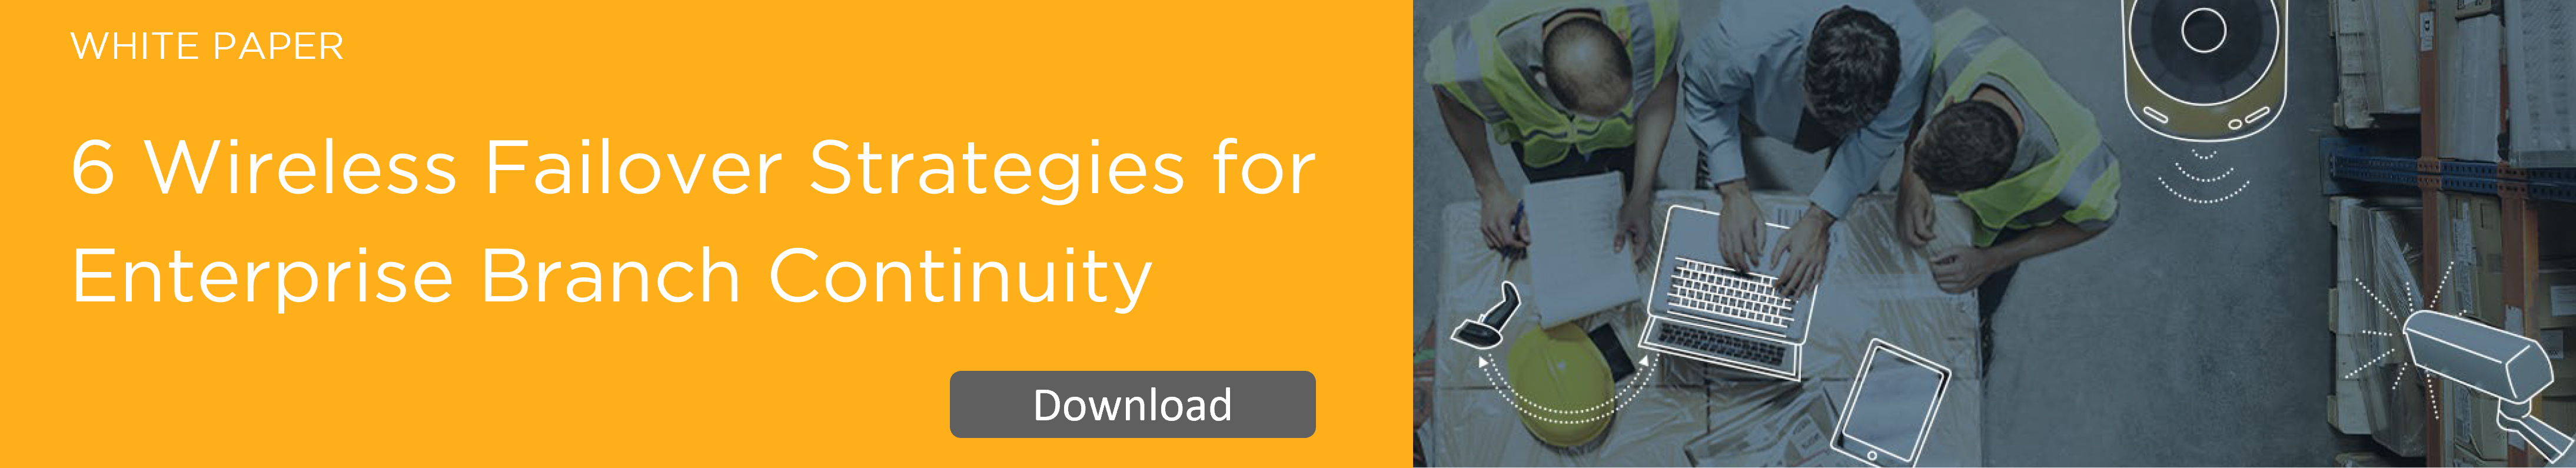 6 Wireless Failover Strategies Download White Paper